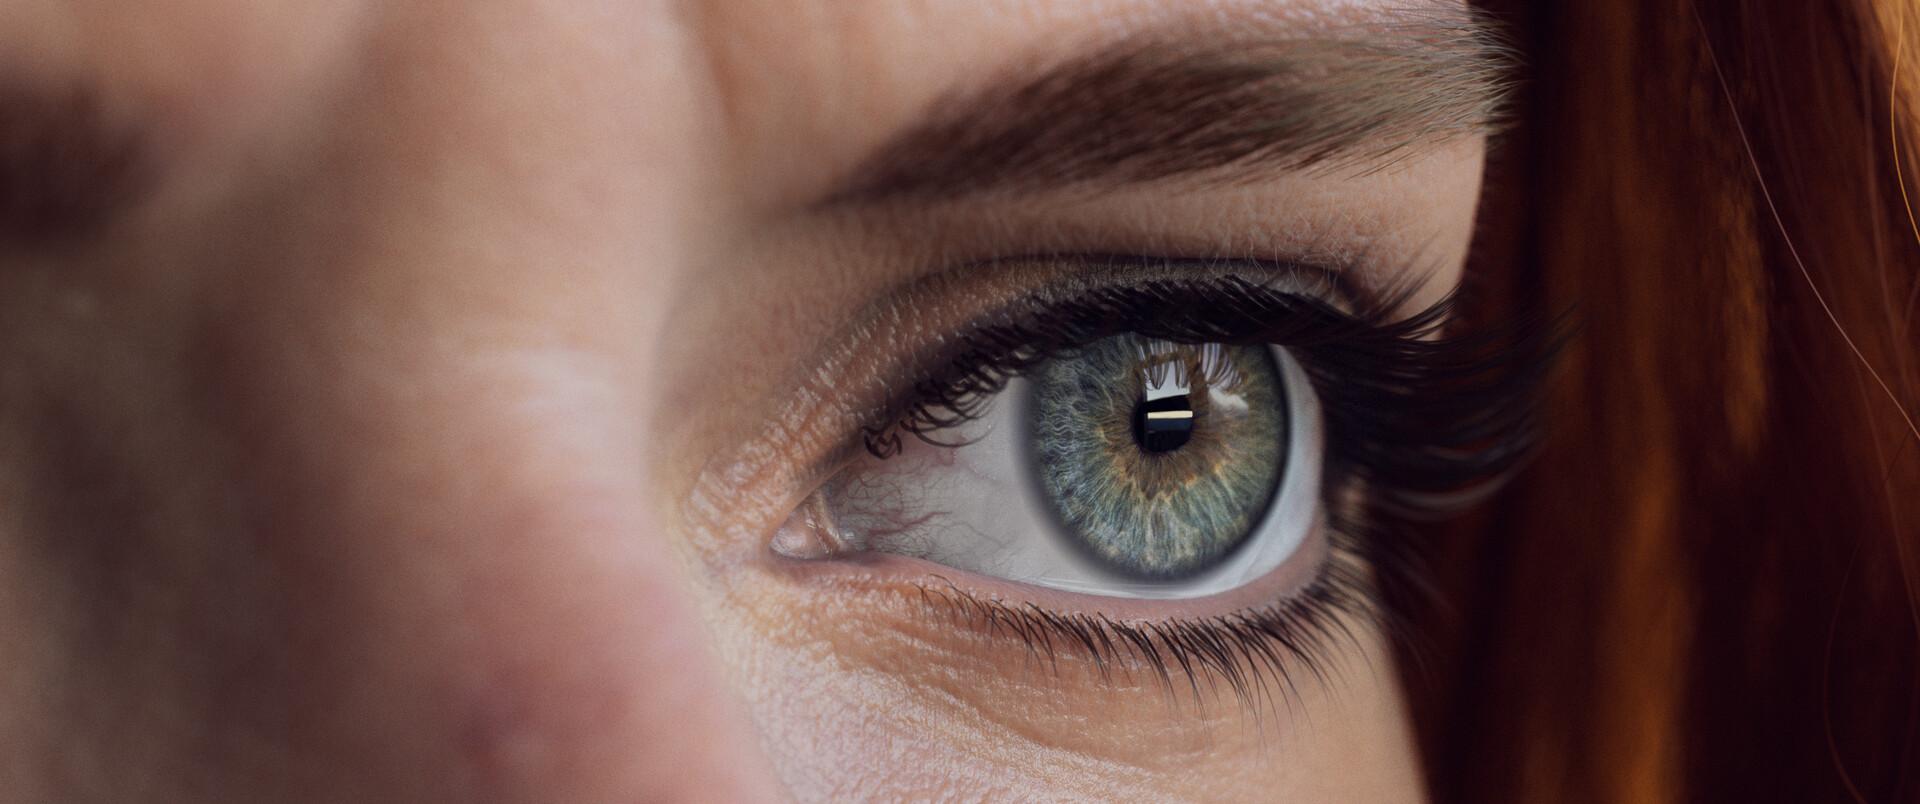 Abdelrahman kubisi eye closeup 02